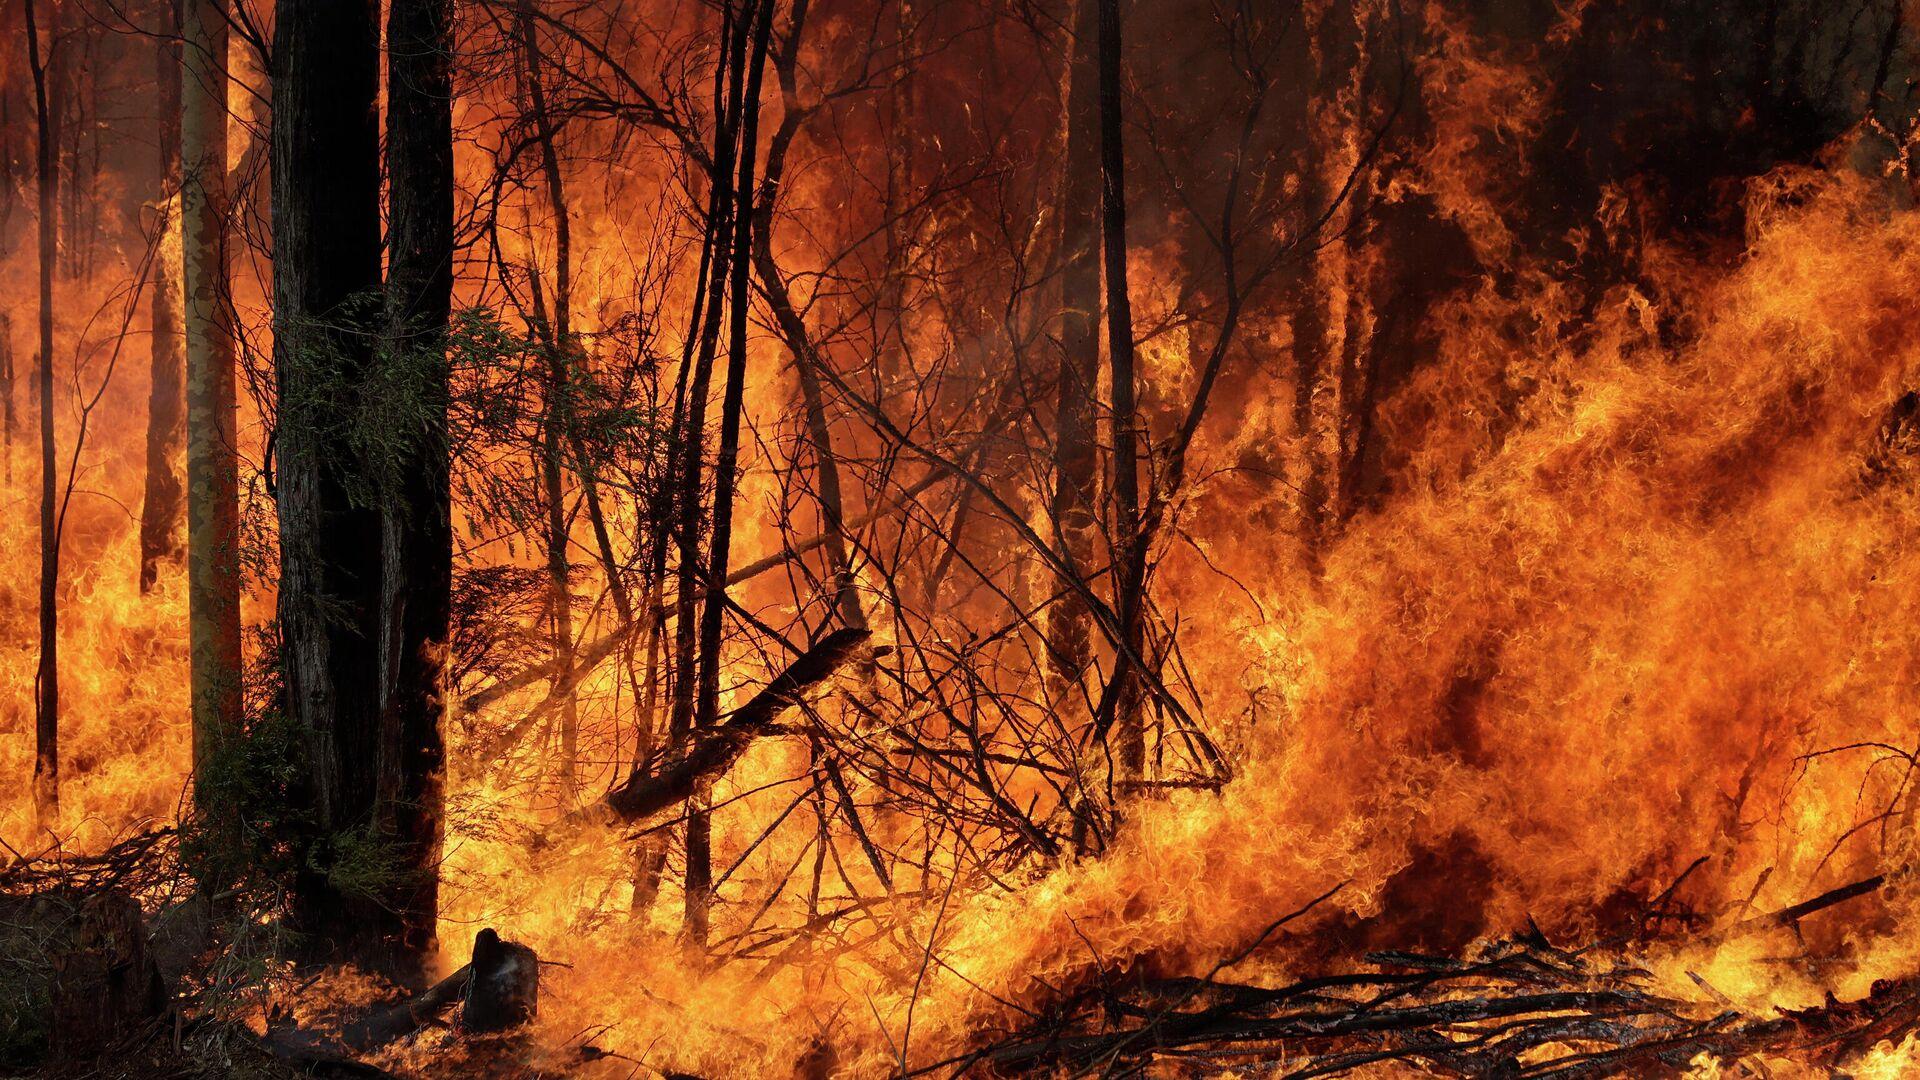 Incendios forestales en Australia - Sputnik Mundo, 1920, 12.04.2021